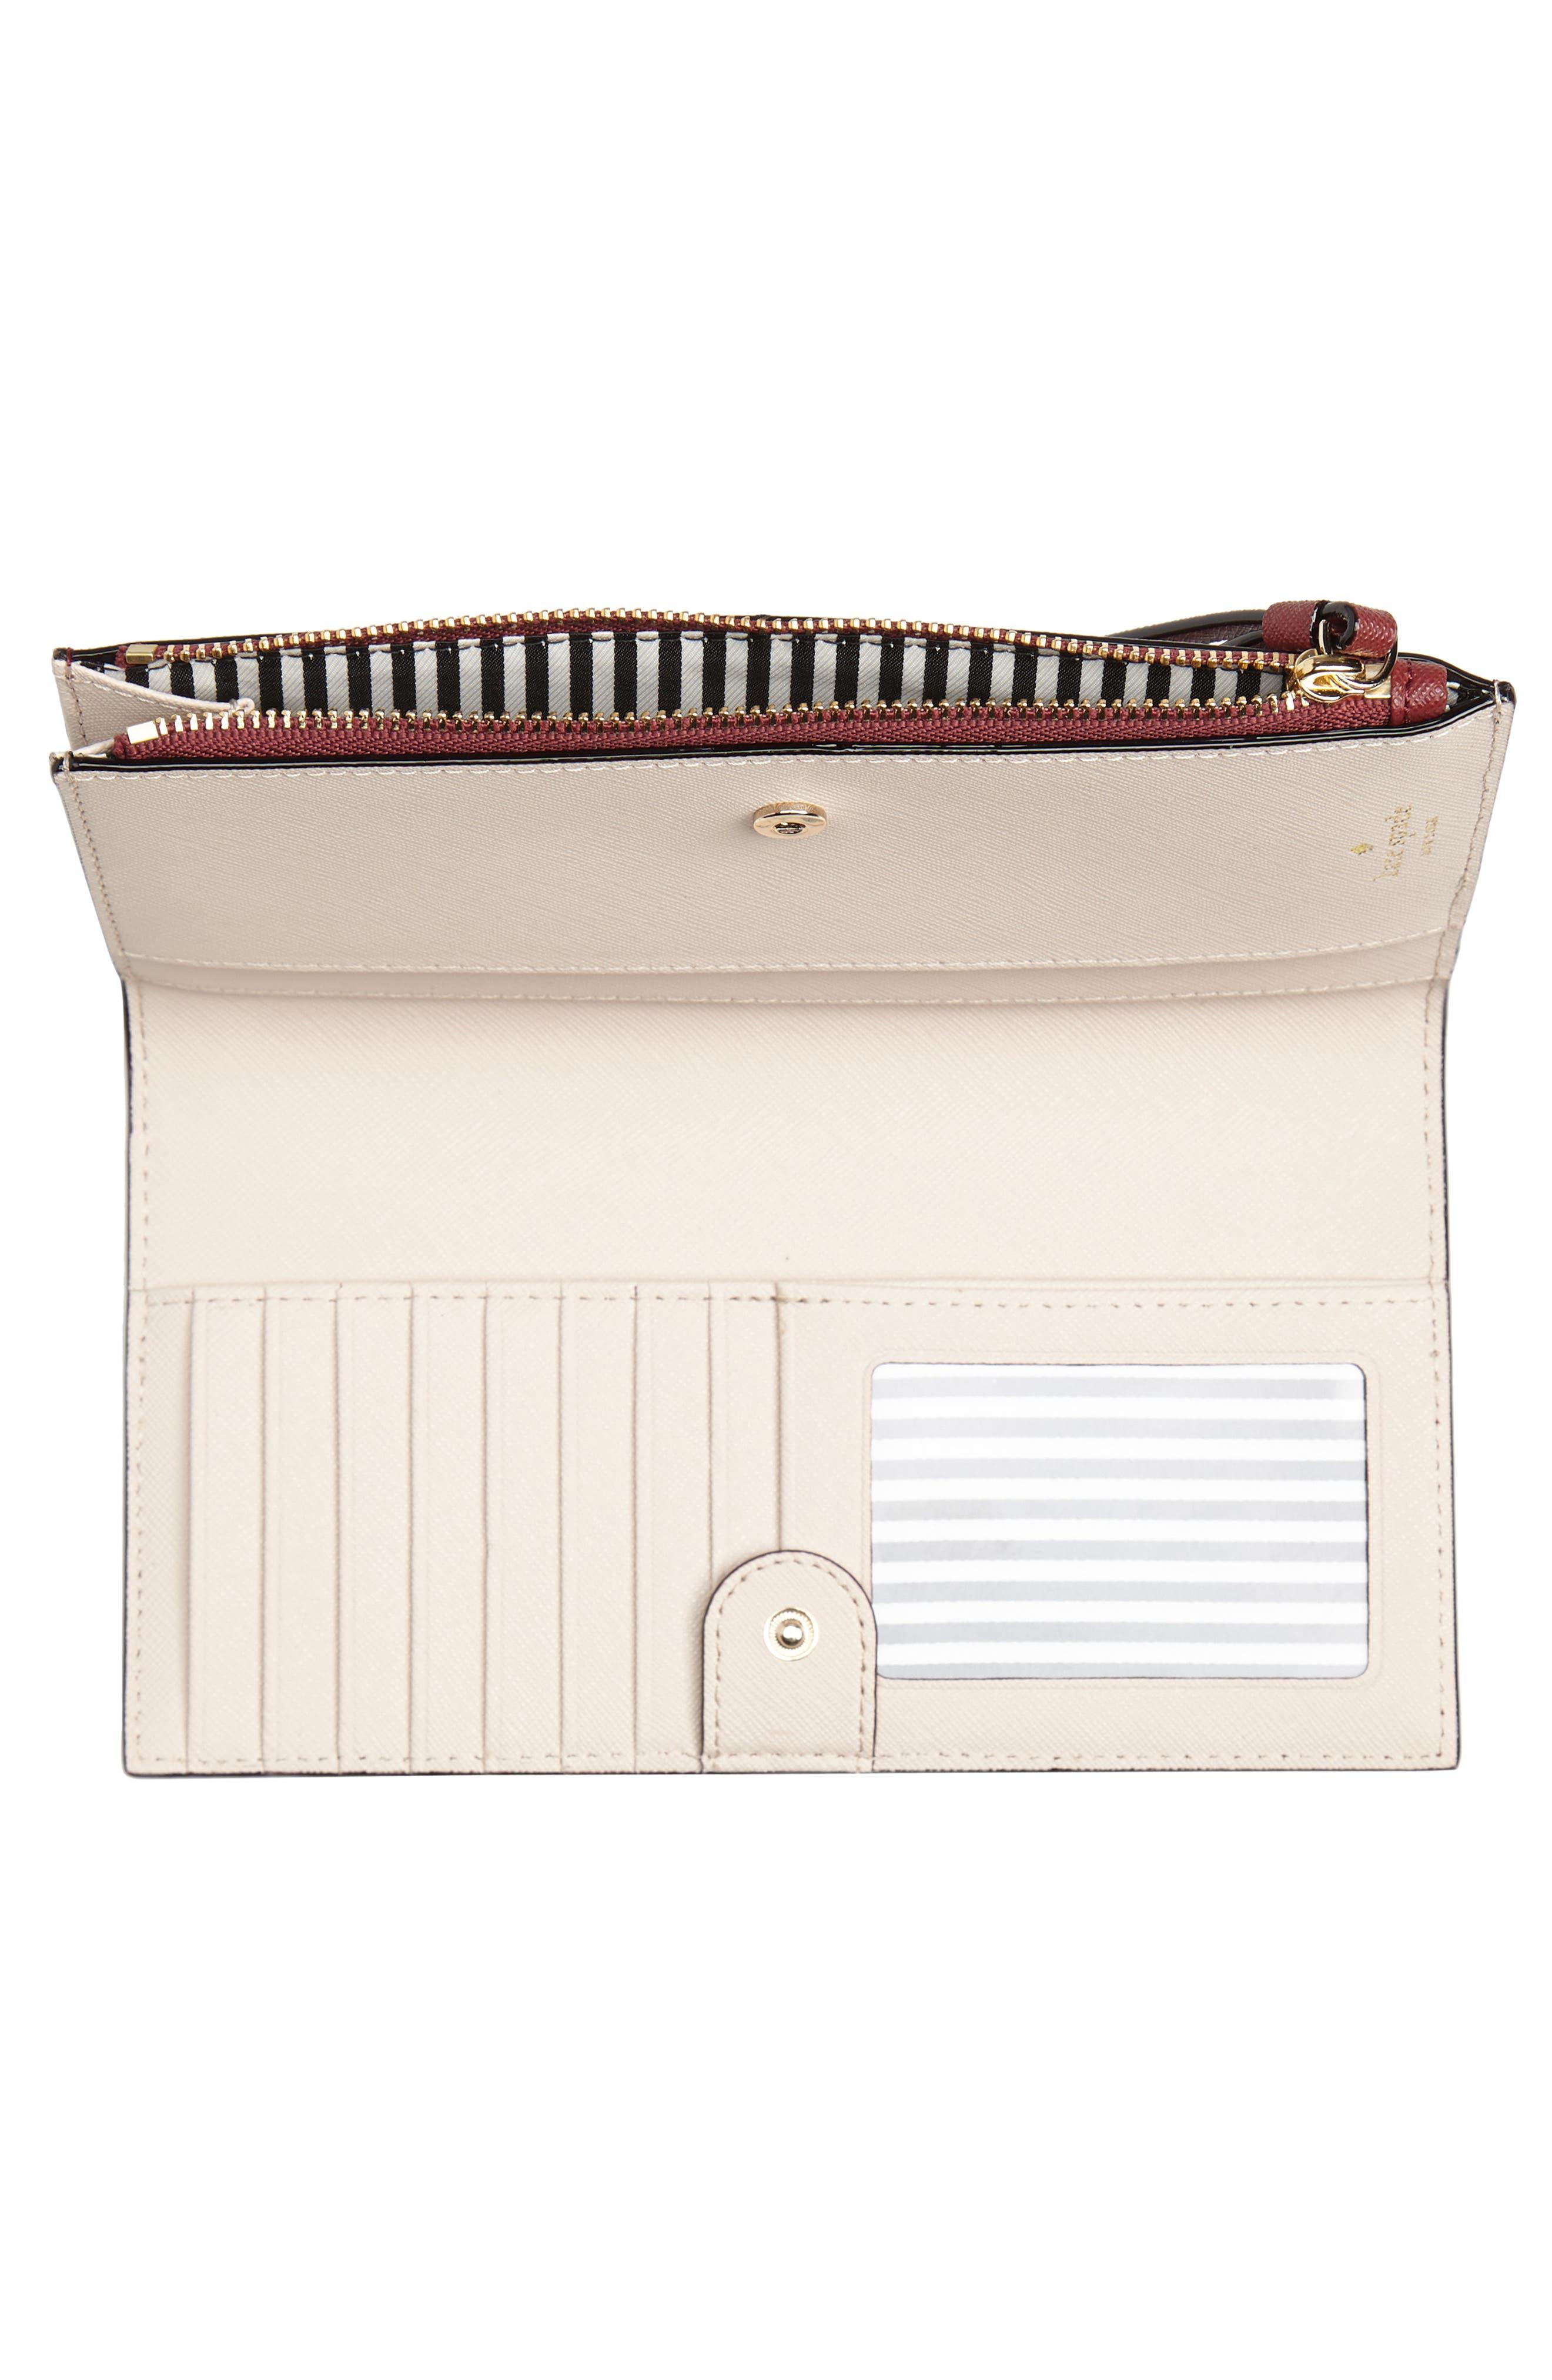 cameron street - eliza leather wallet,                             Alternate thumbnail 2, color,                             Sienna/ Tusk